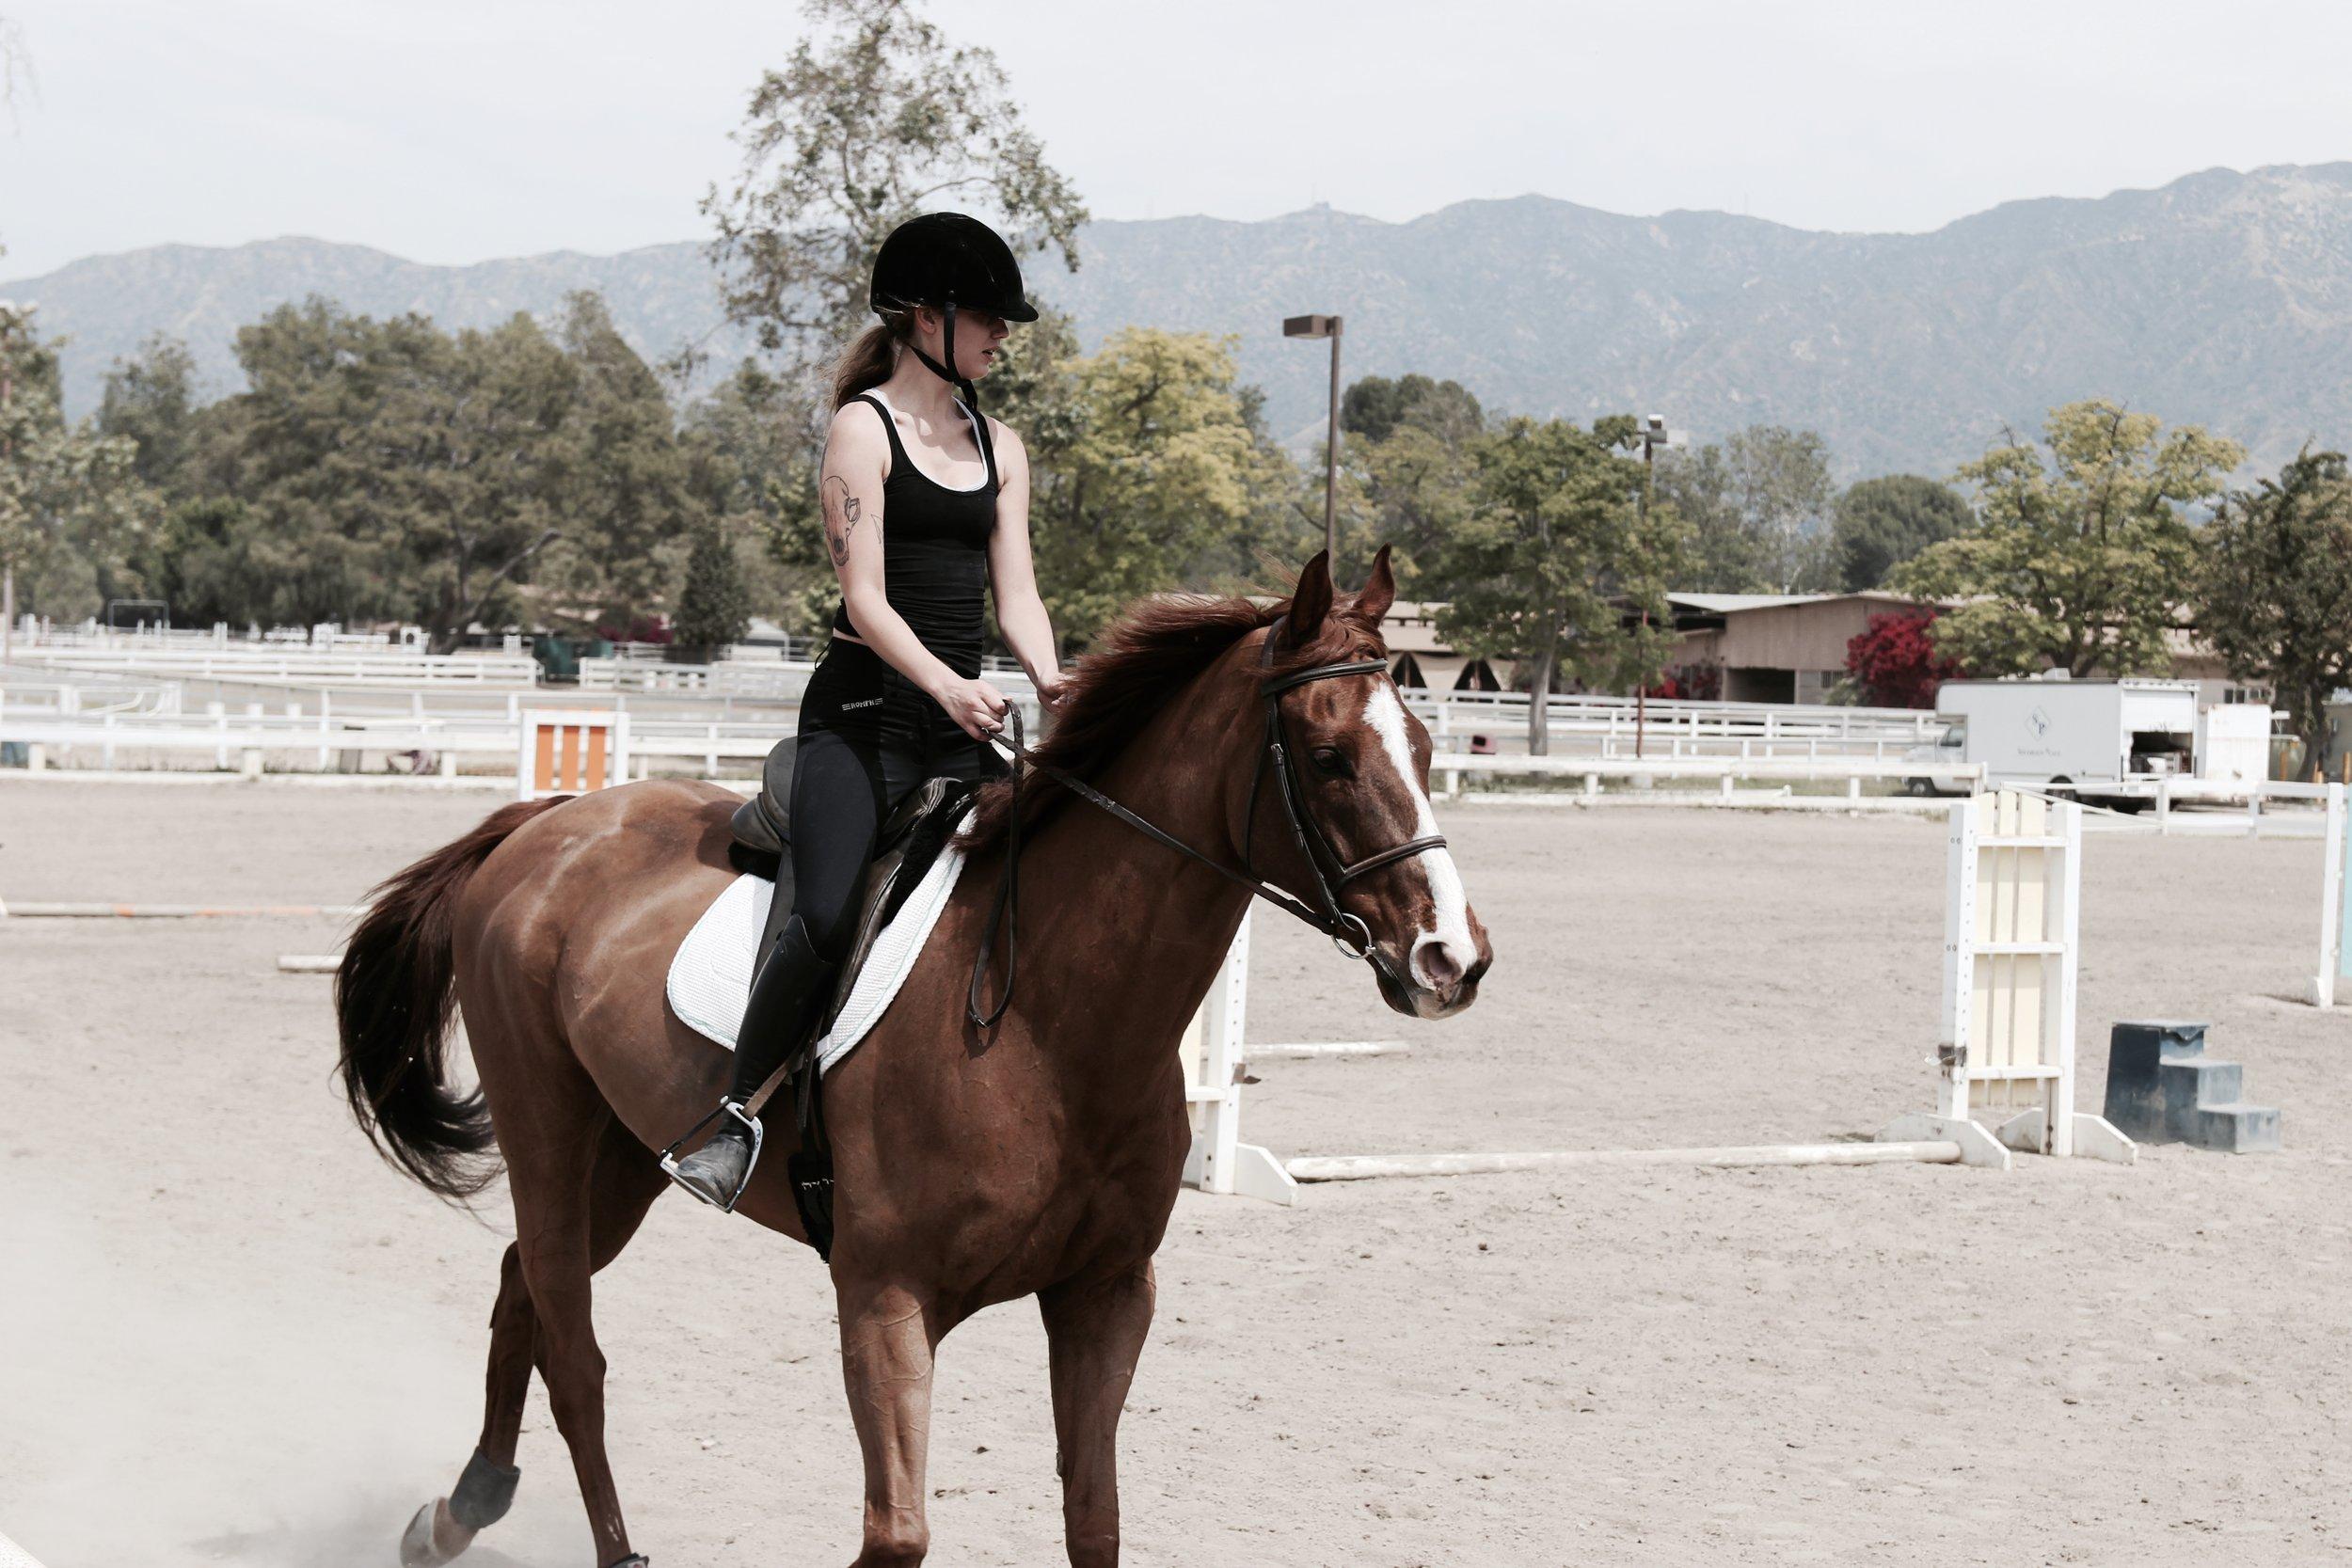 ON A HORSE, BURBANK CA 2017